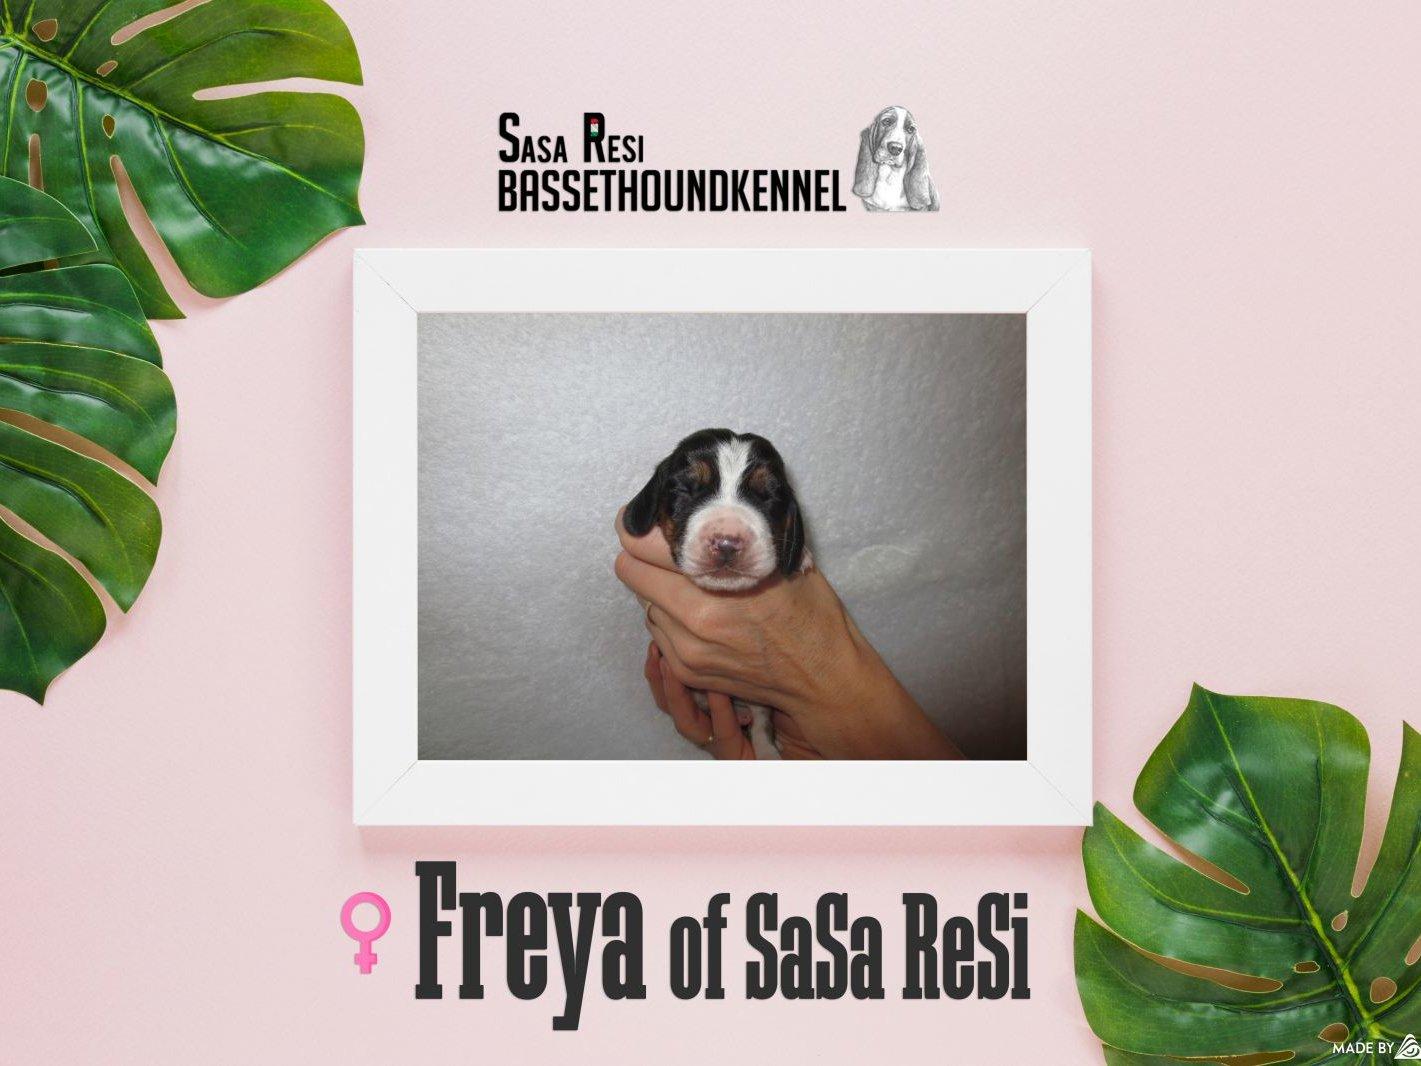 Freya1 uai SaSa ReSi Bassethoundkennel